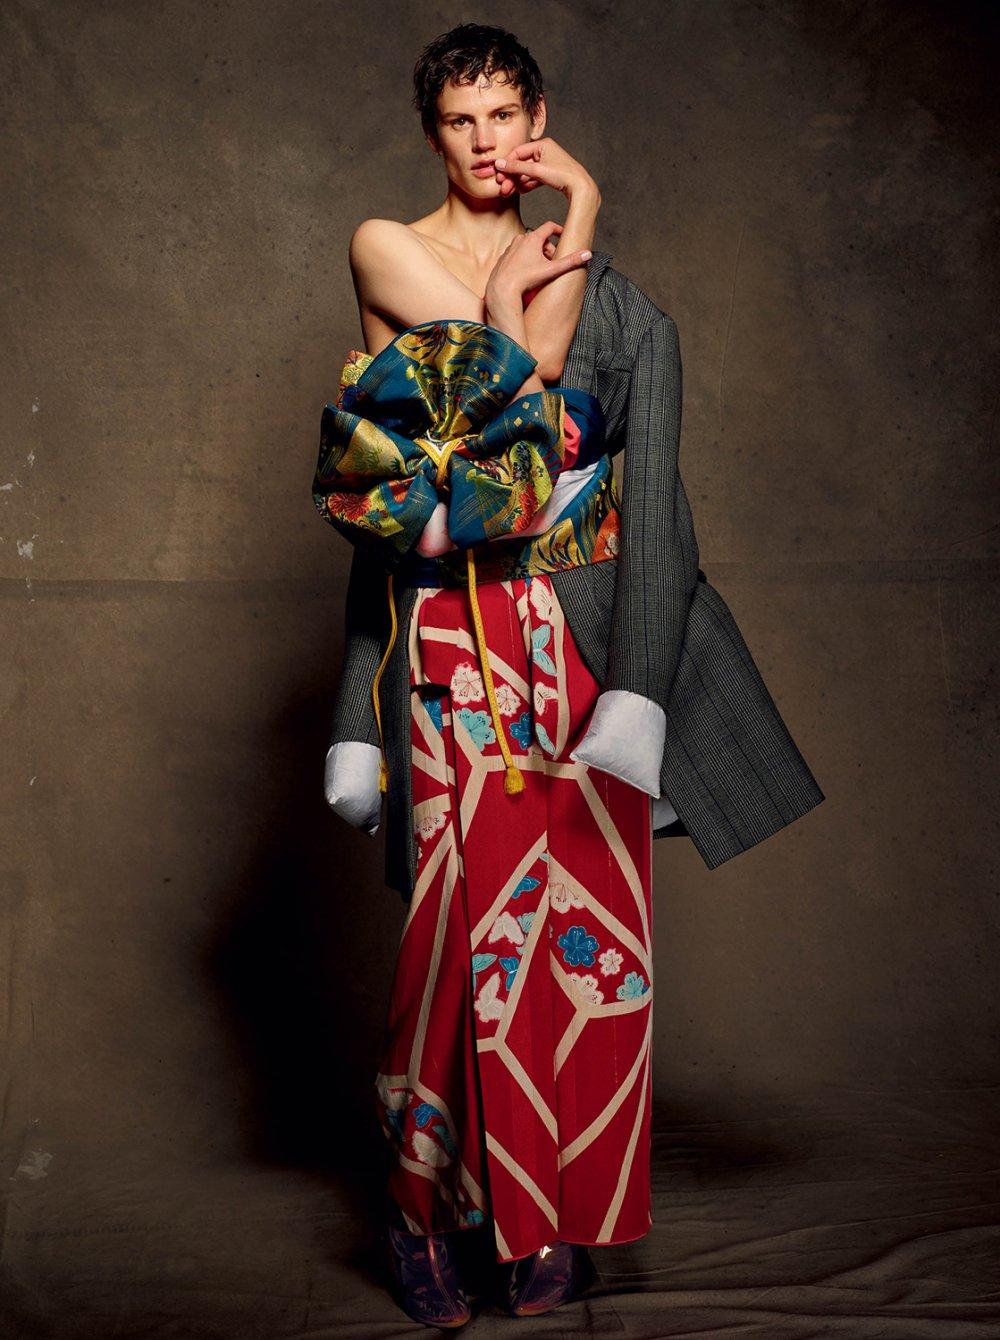 New fashion photography book 48